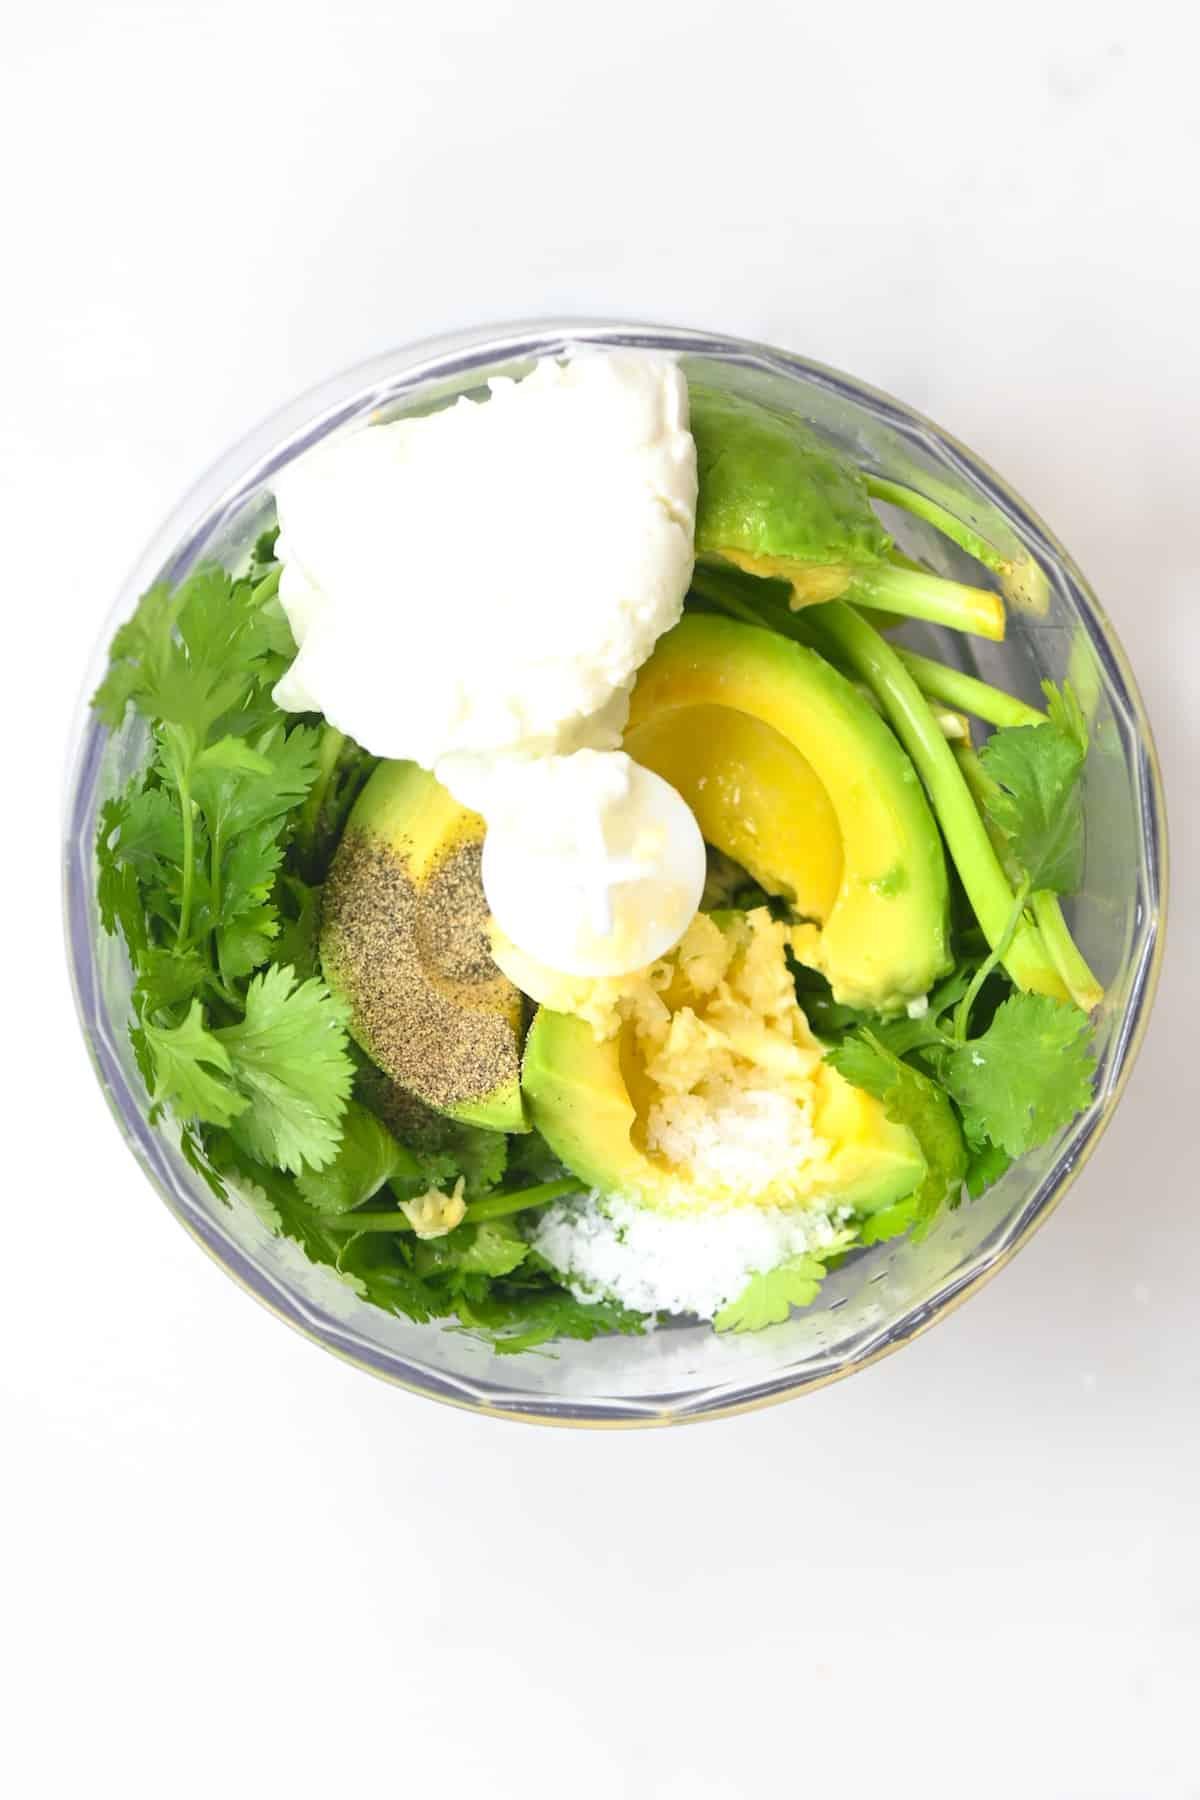 processing the ingredients for Creamy Avocado Cilantro Sauce